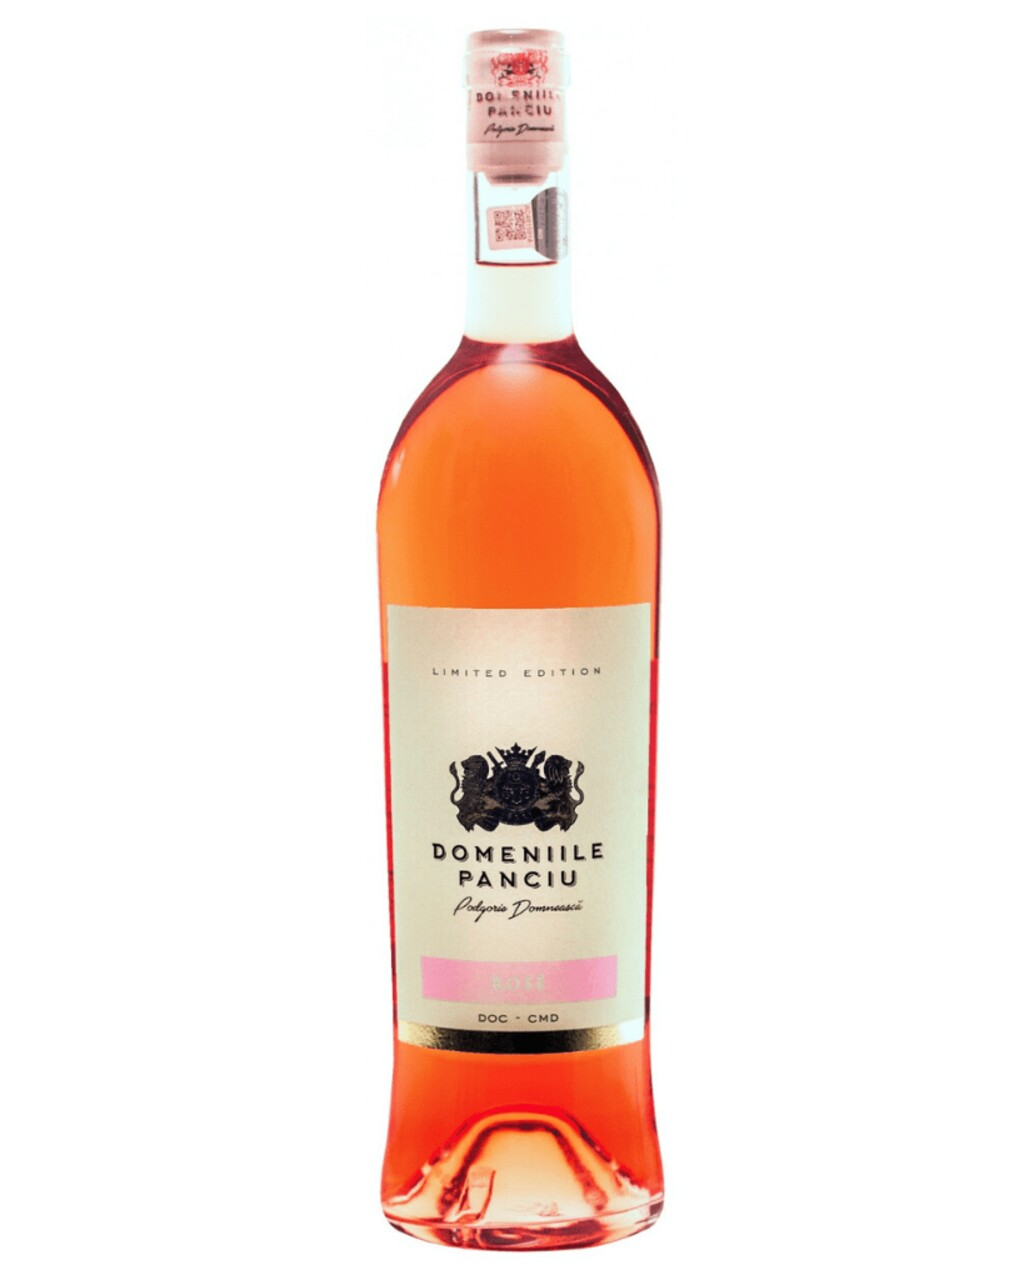 Domeniile Panciu Cabernet Sauvignon Rose